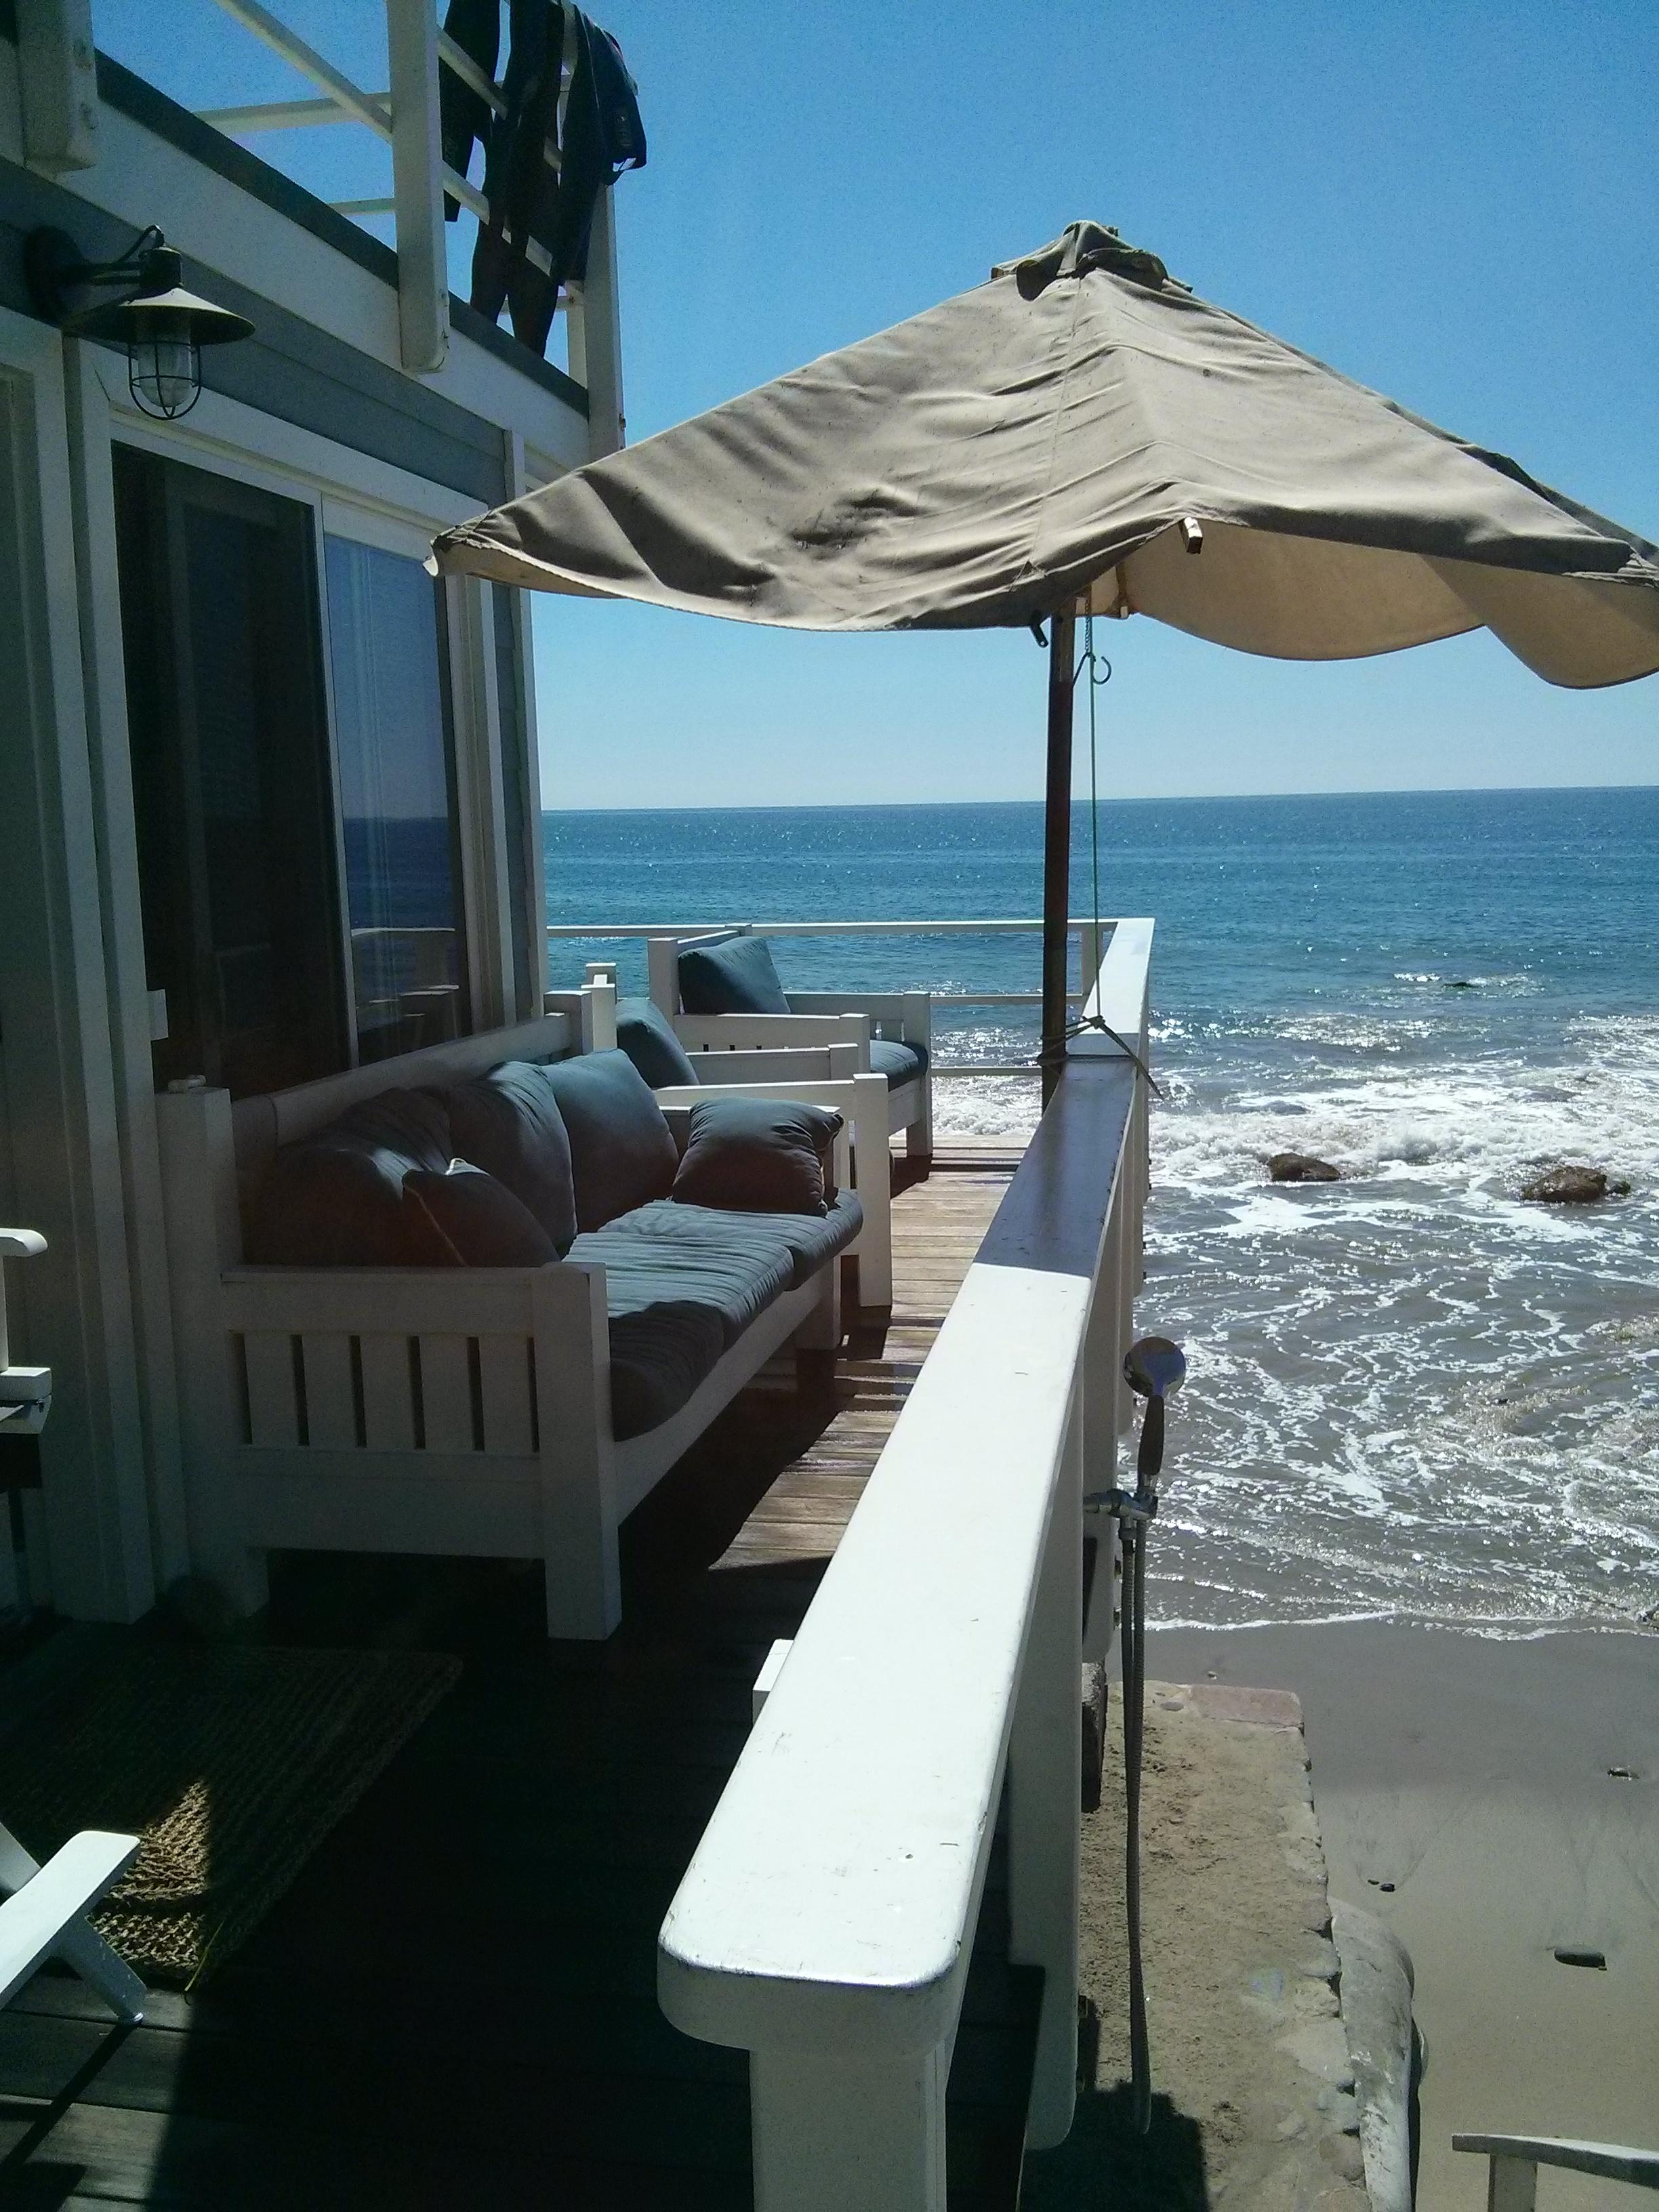 Screen Doors in Malibu Summer Beach House